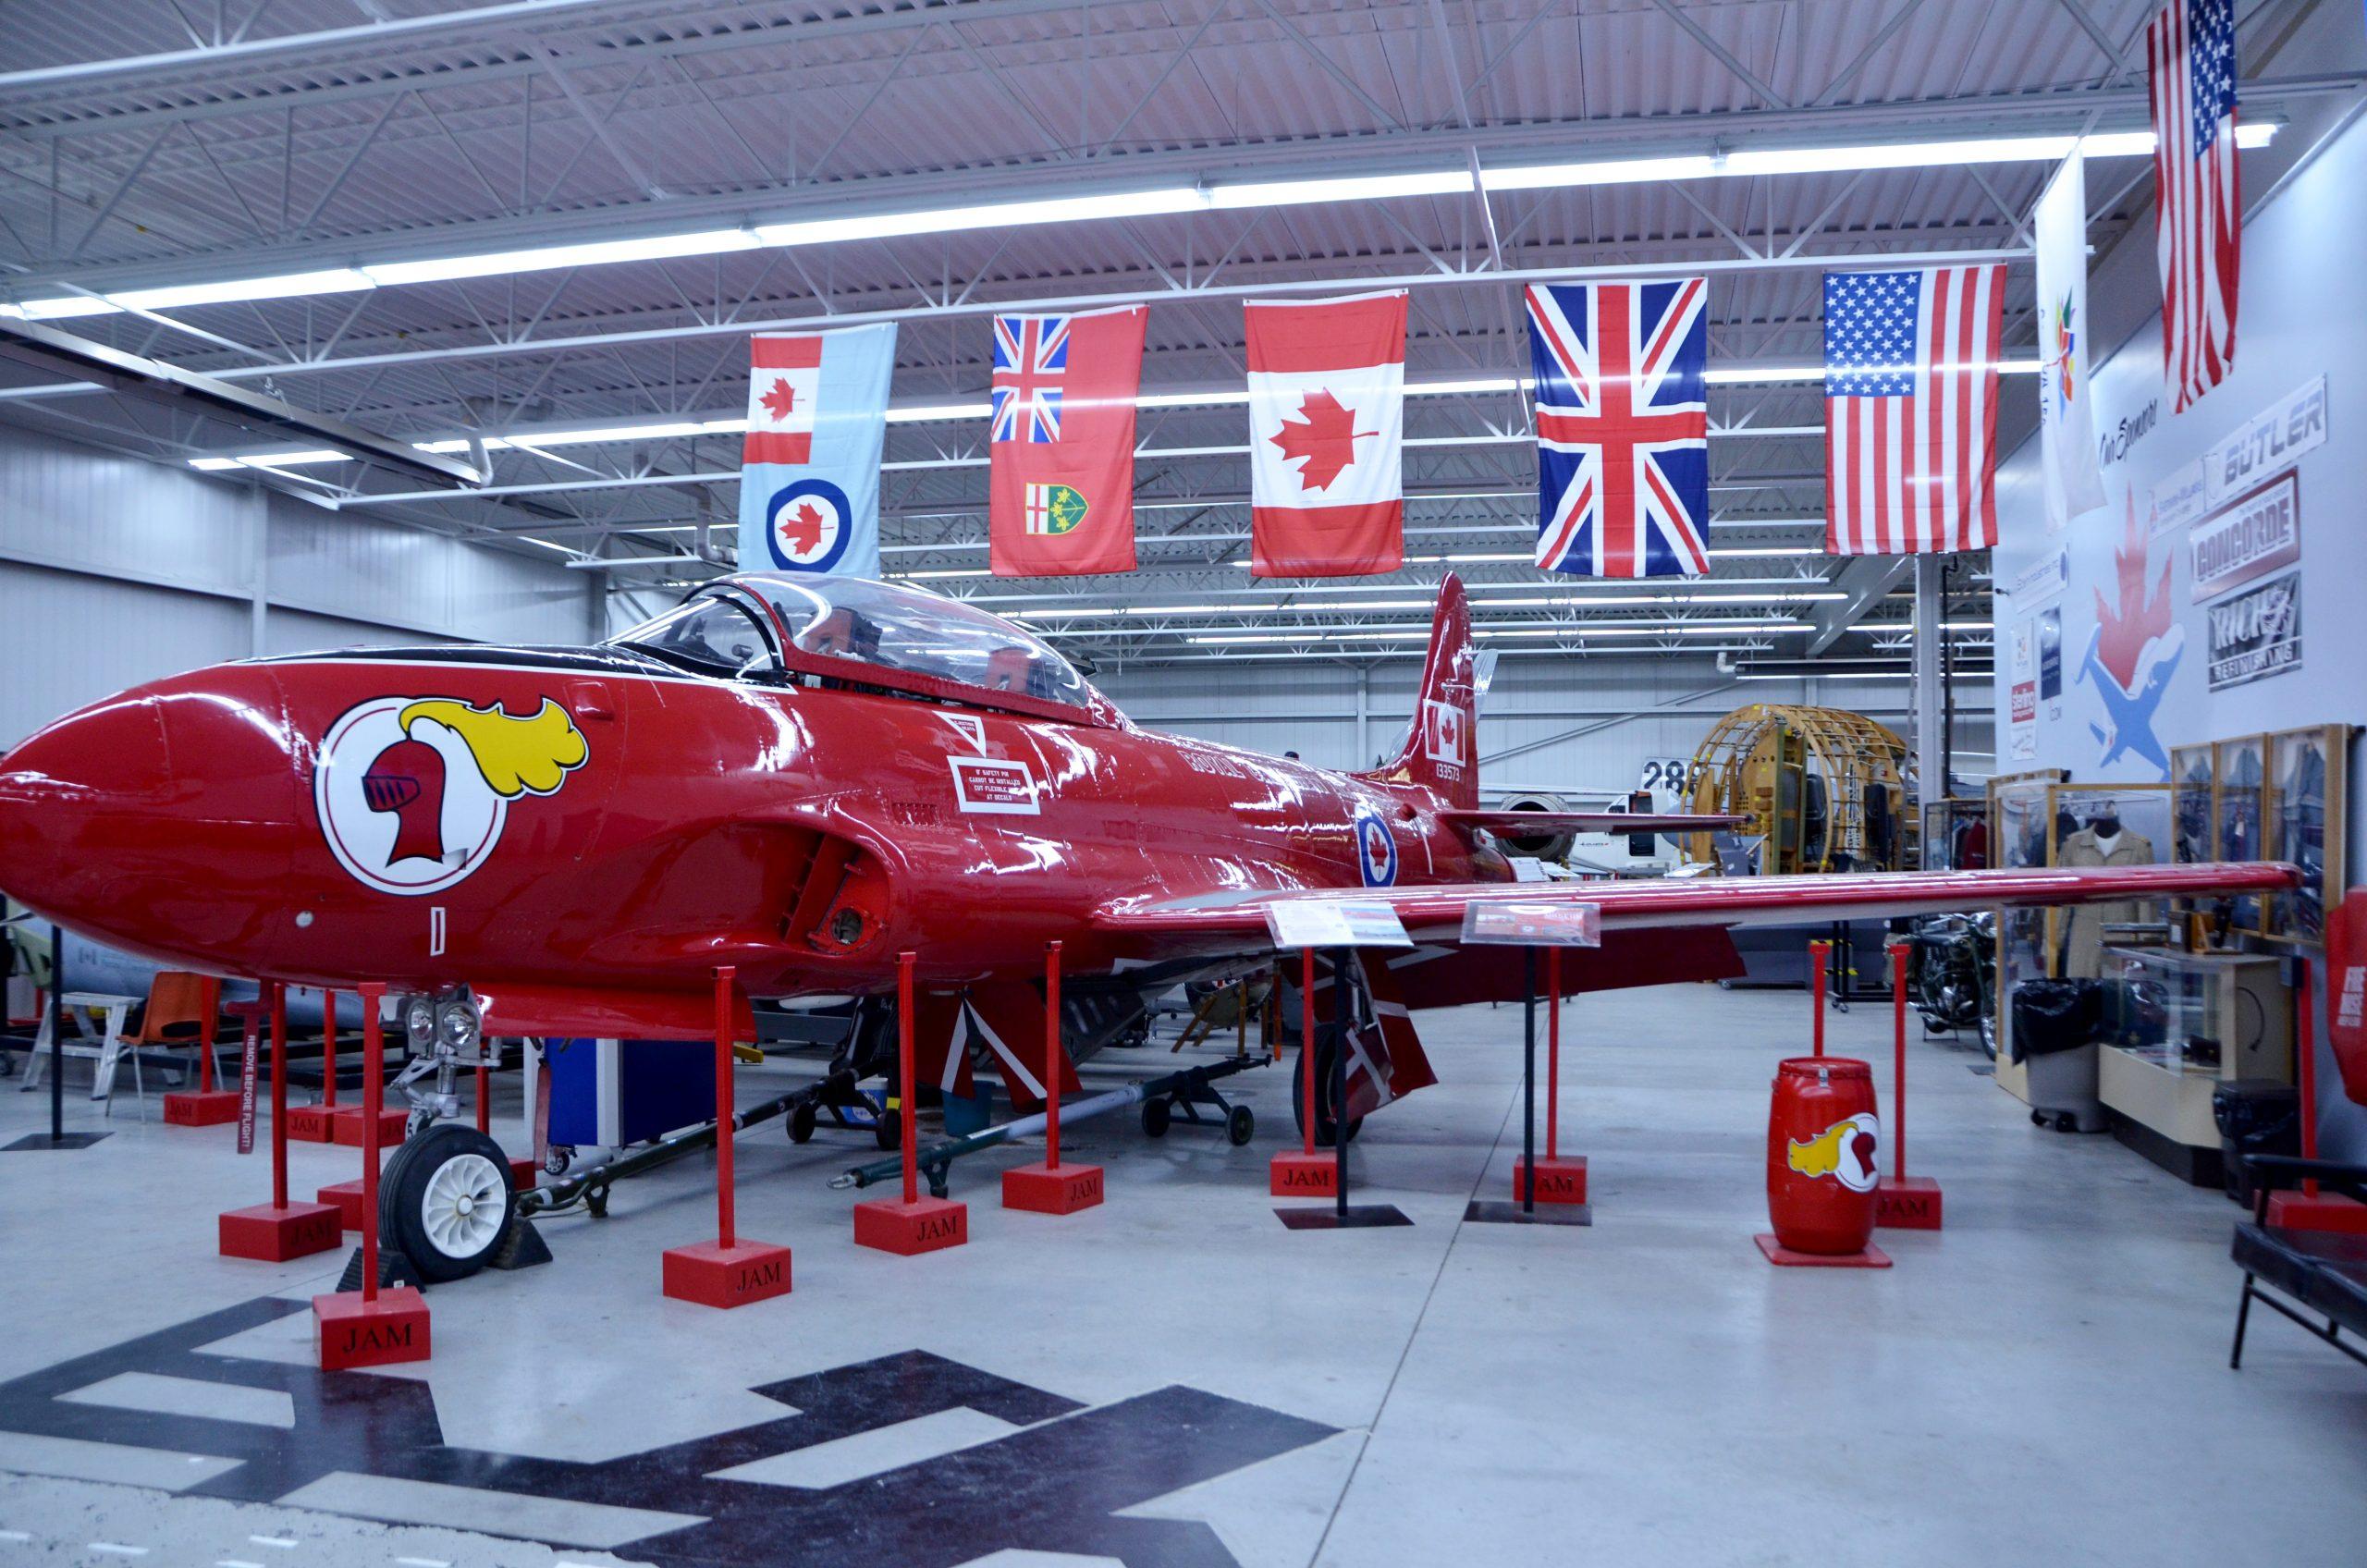 Jet Air Craft Museum, red plane image